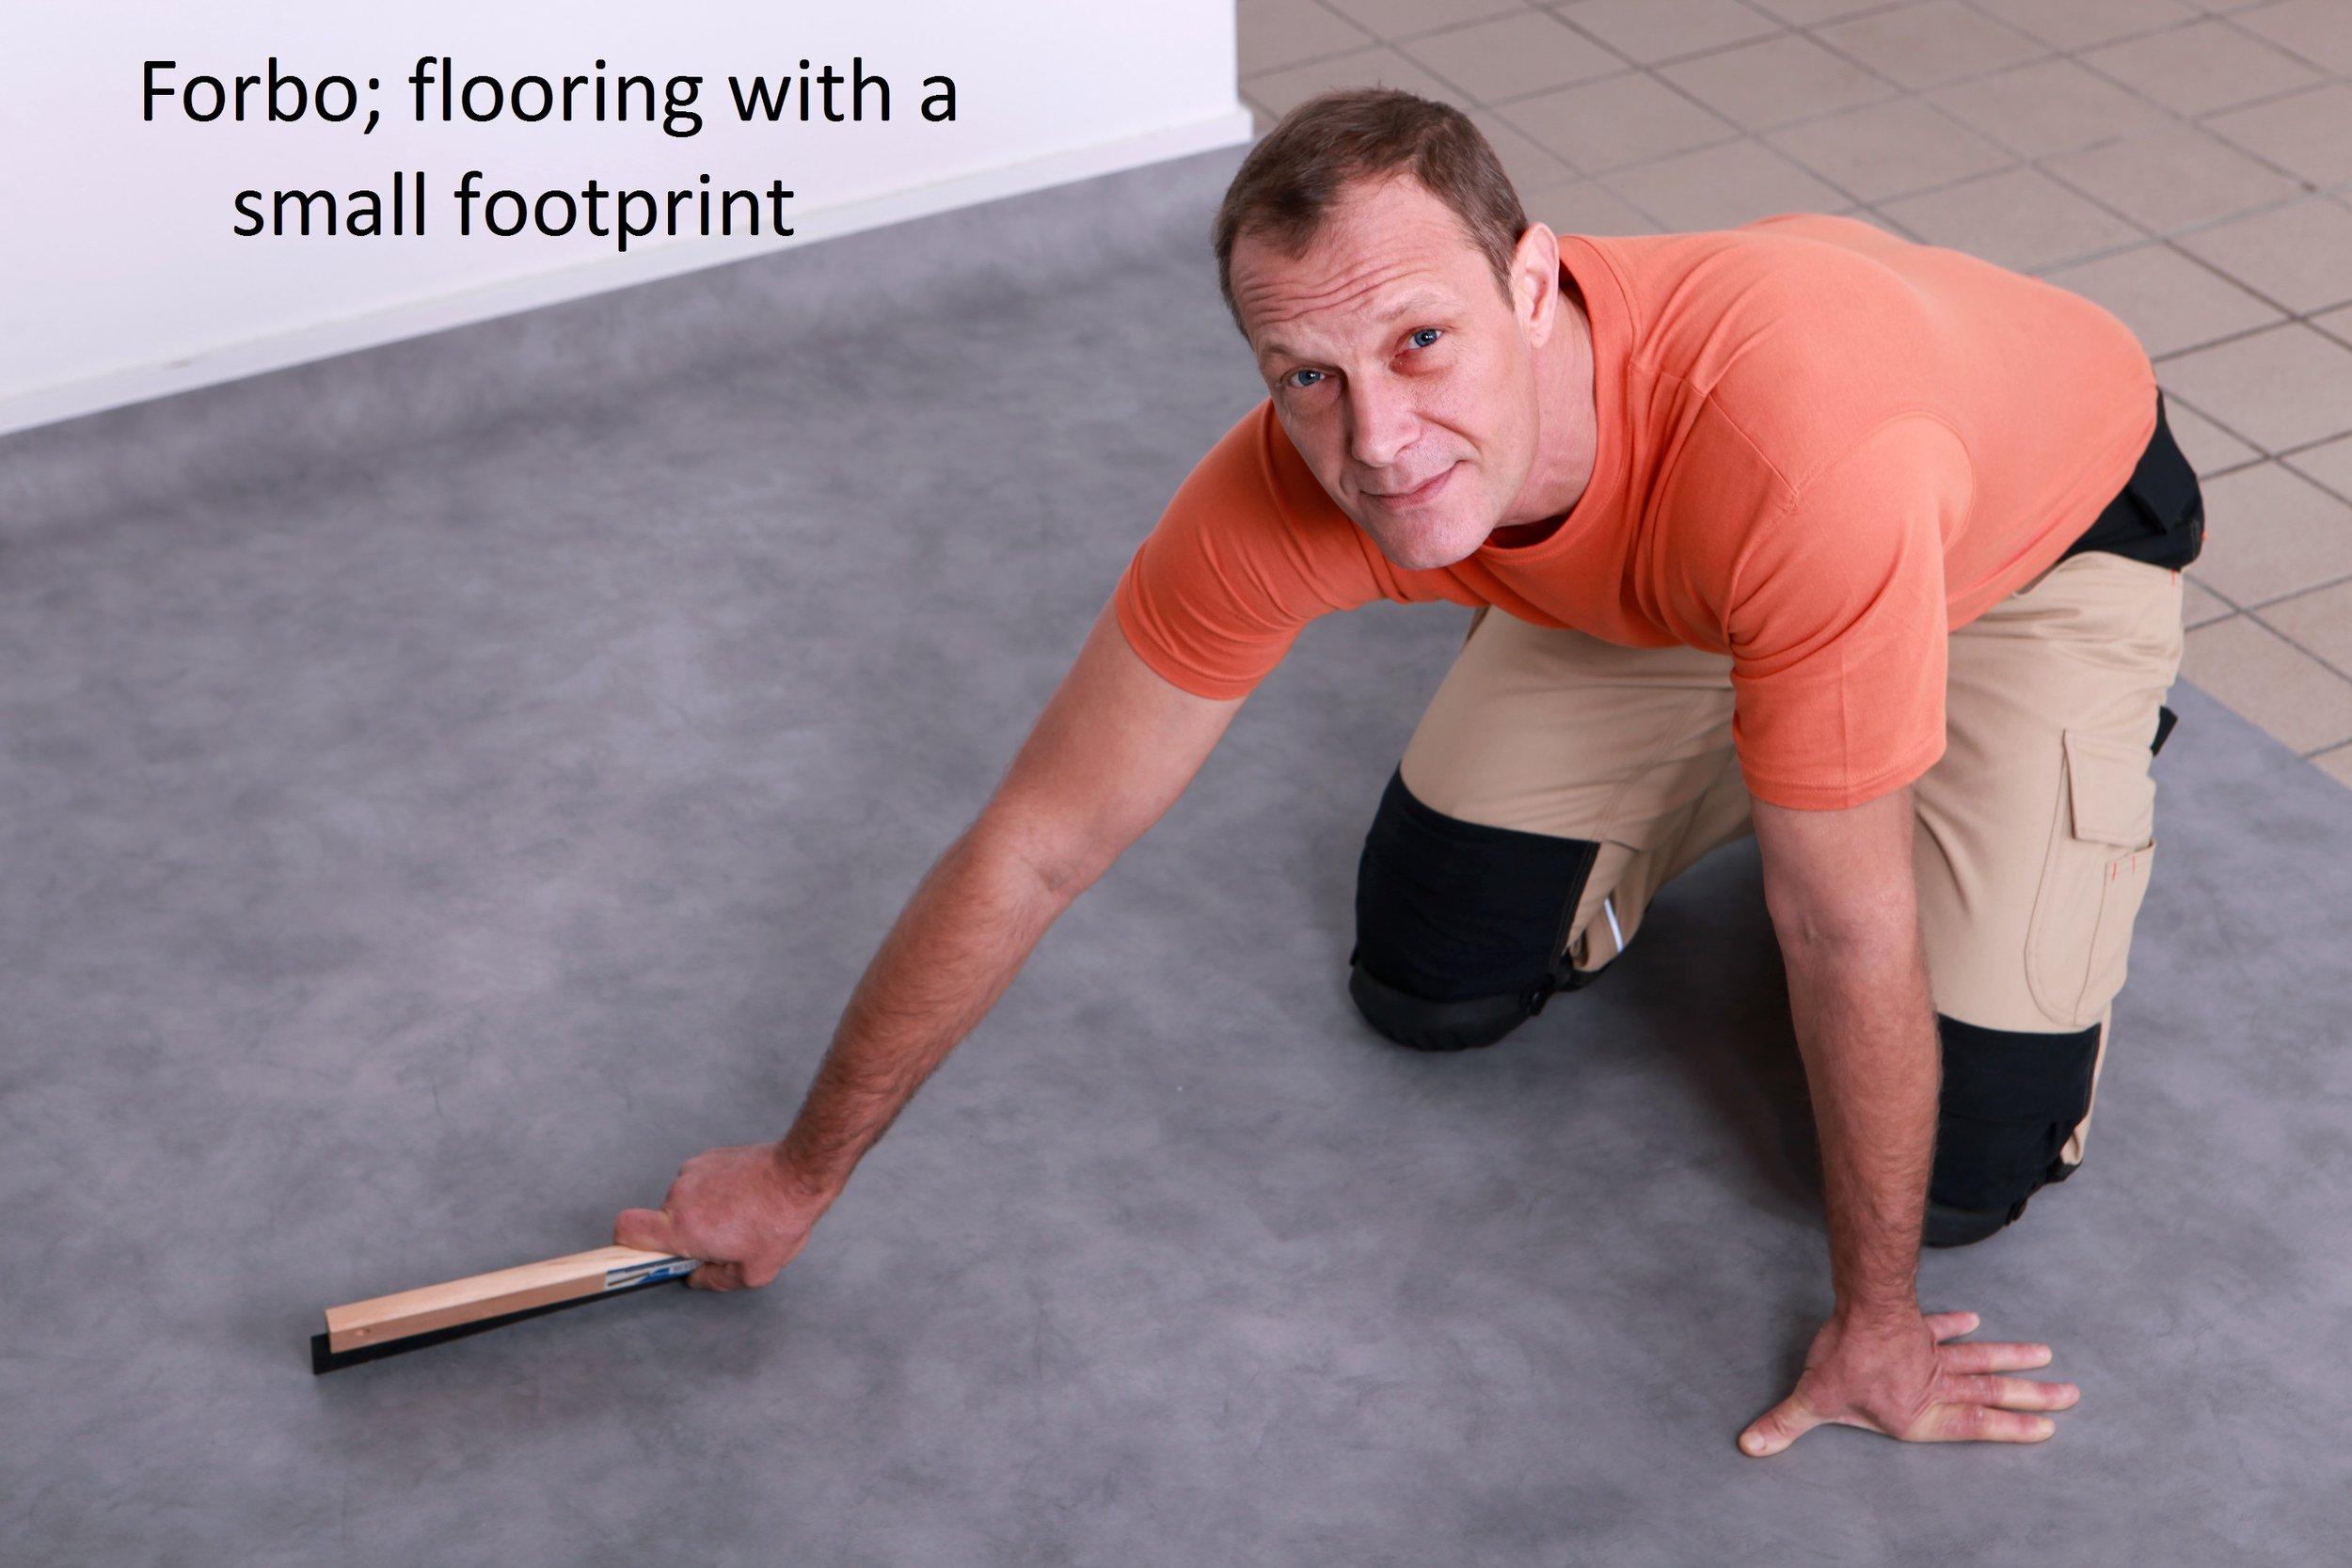 forbo small footprint.jpg